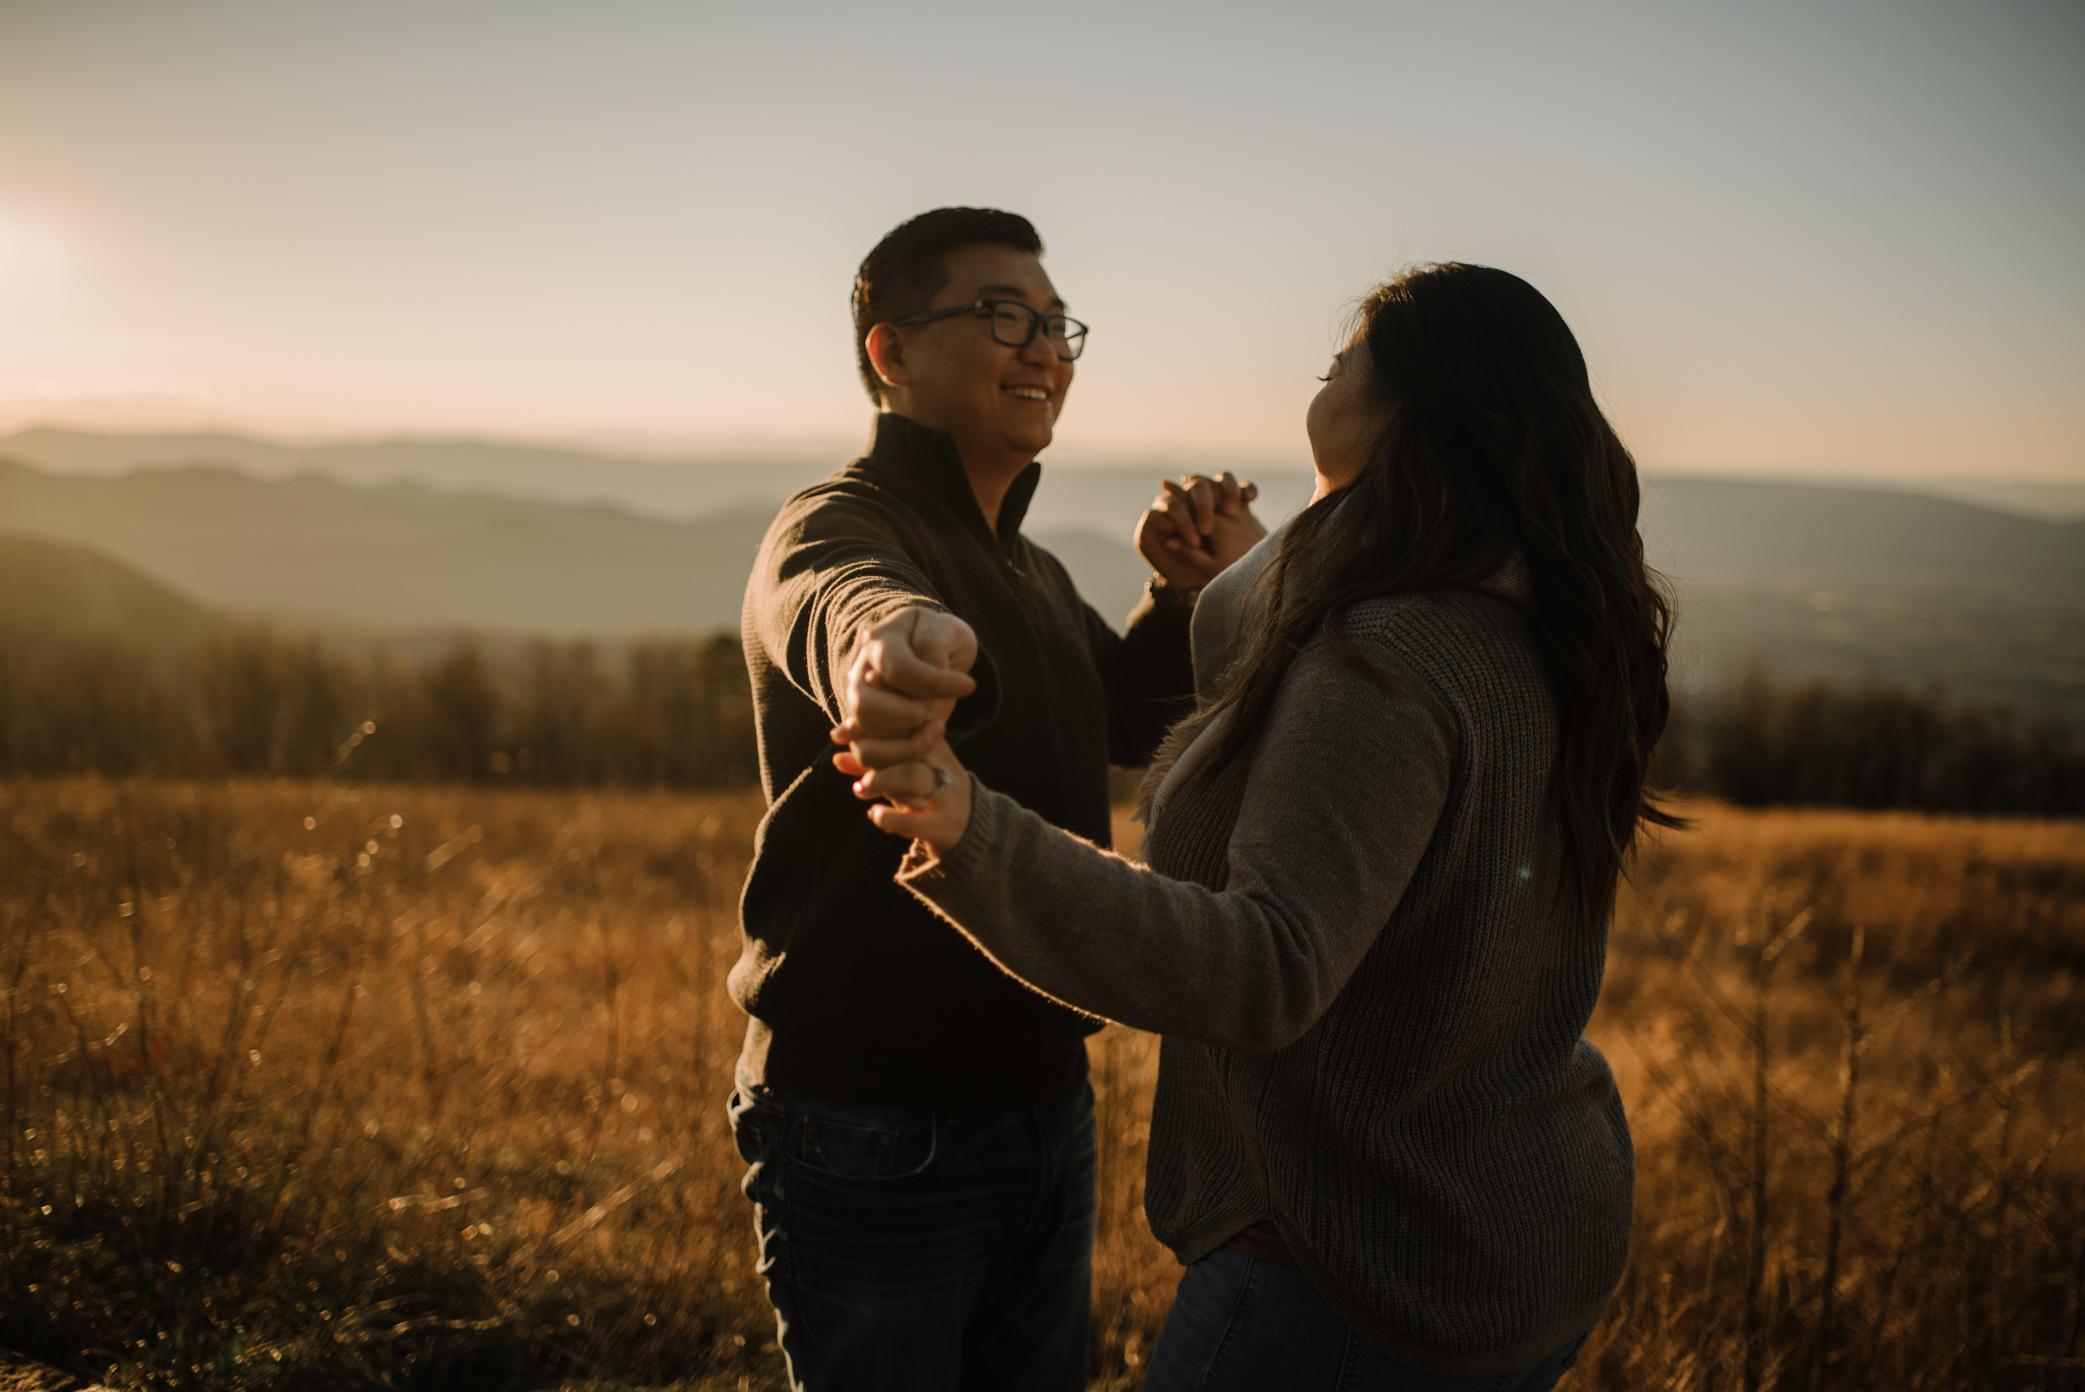 Joshua and Kristina - Shenandoah National Park - Skyline Drive - Winter Engagement Session Photographer - White Sails Creative_25.JPG